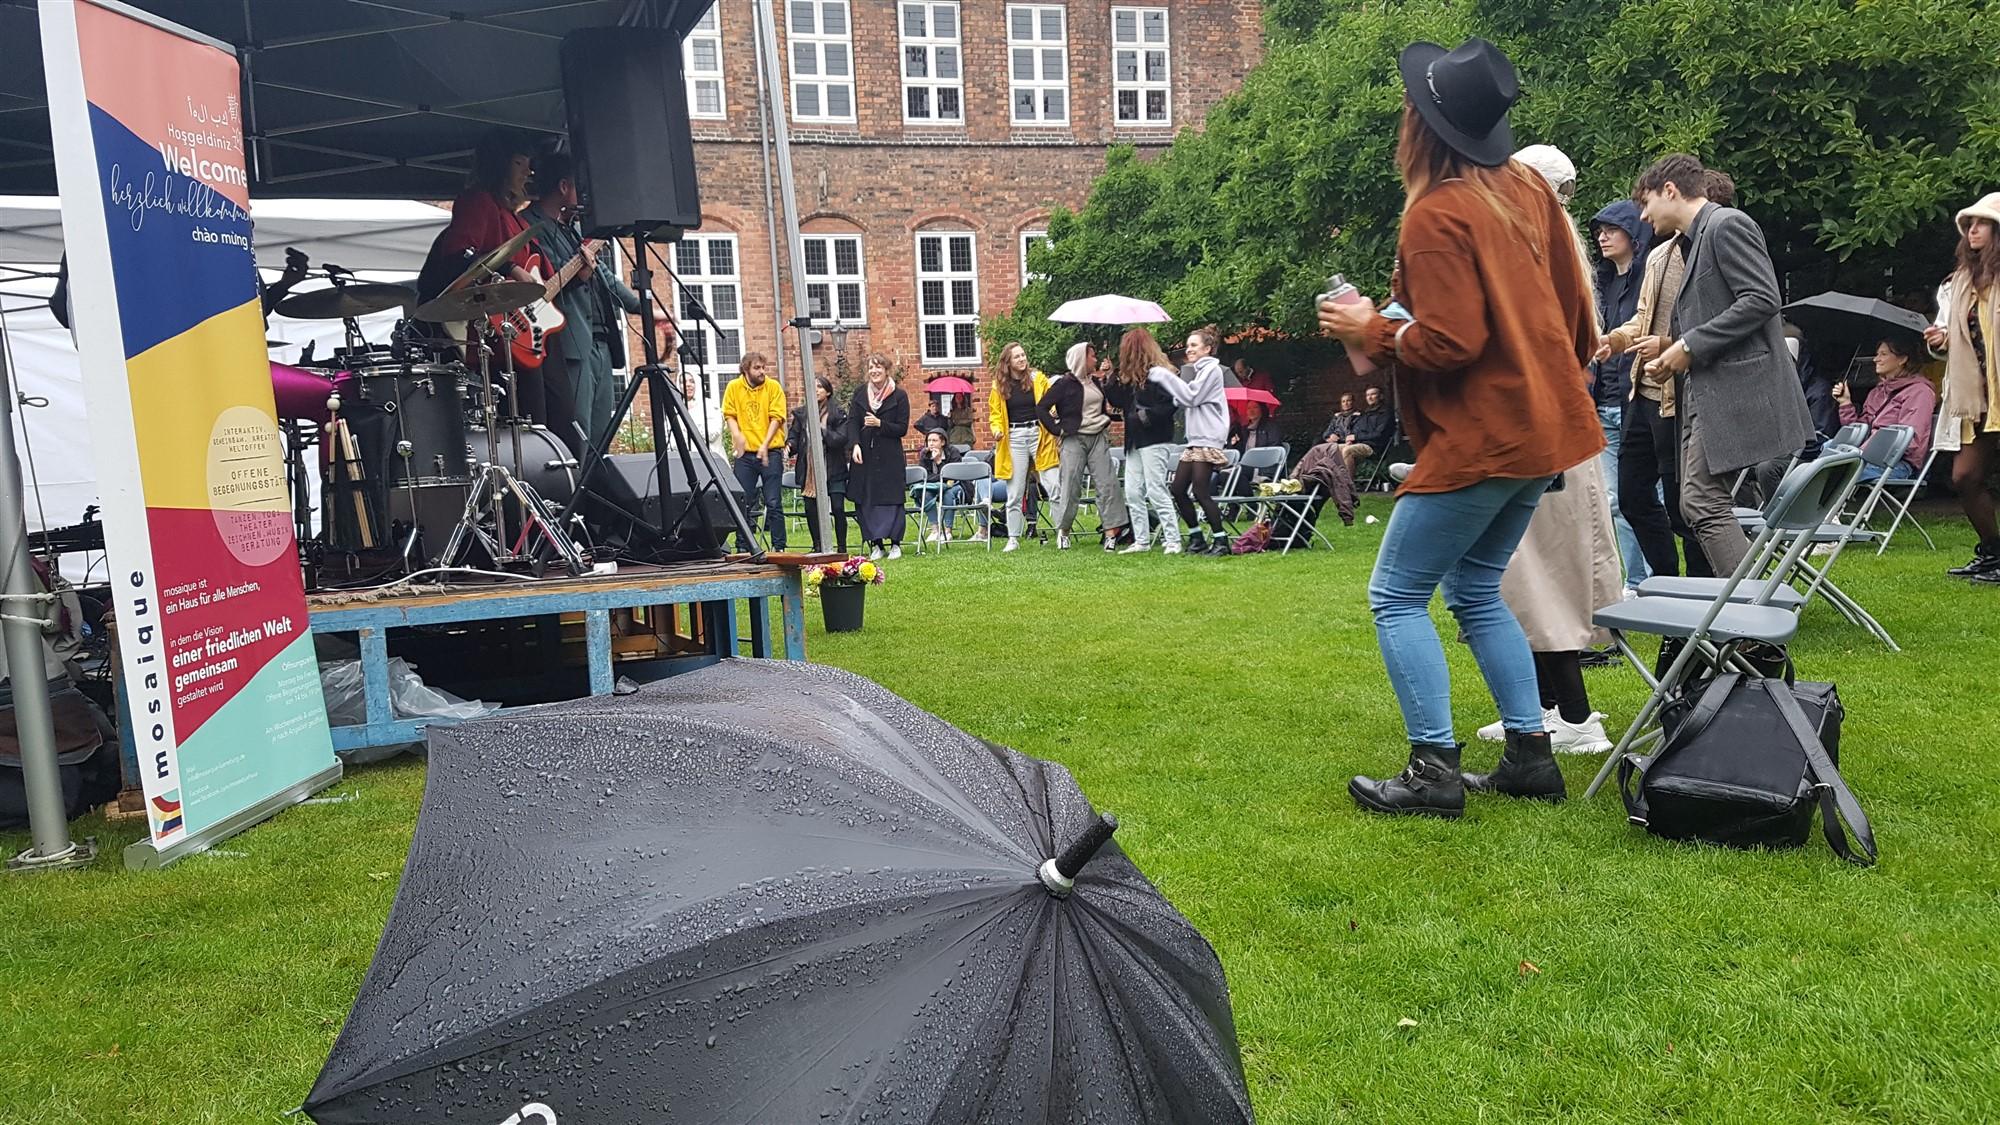 2021-08-28_Rathausgarten-Sommerfestival (24)